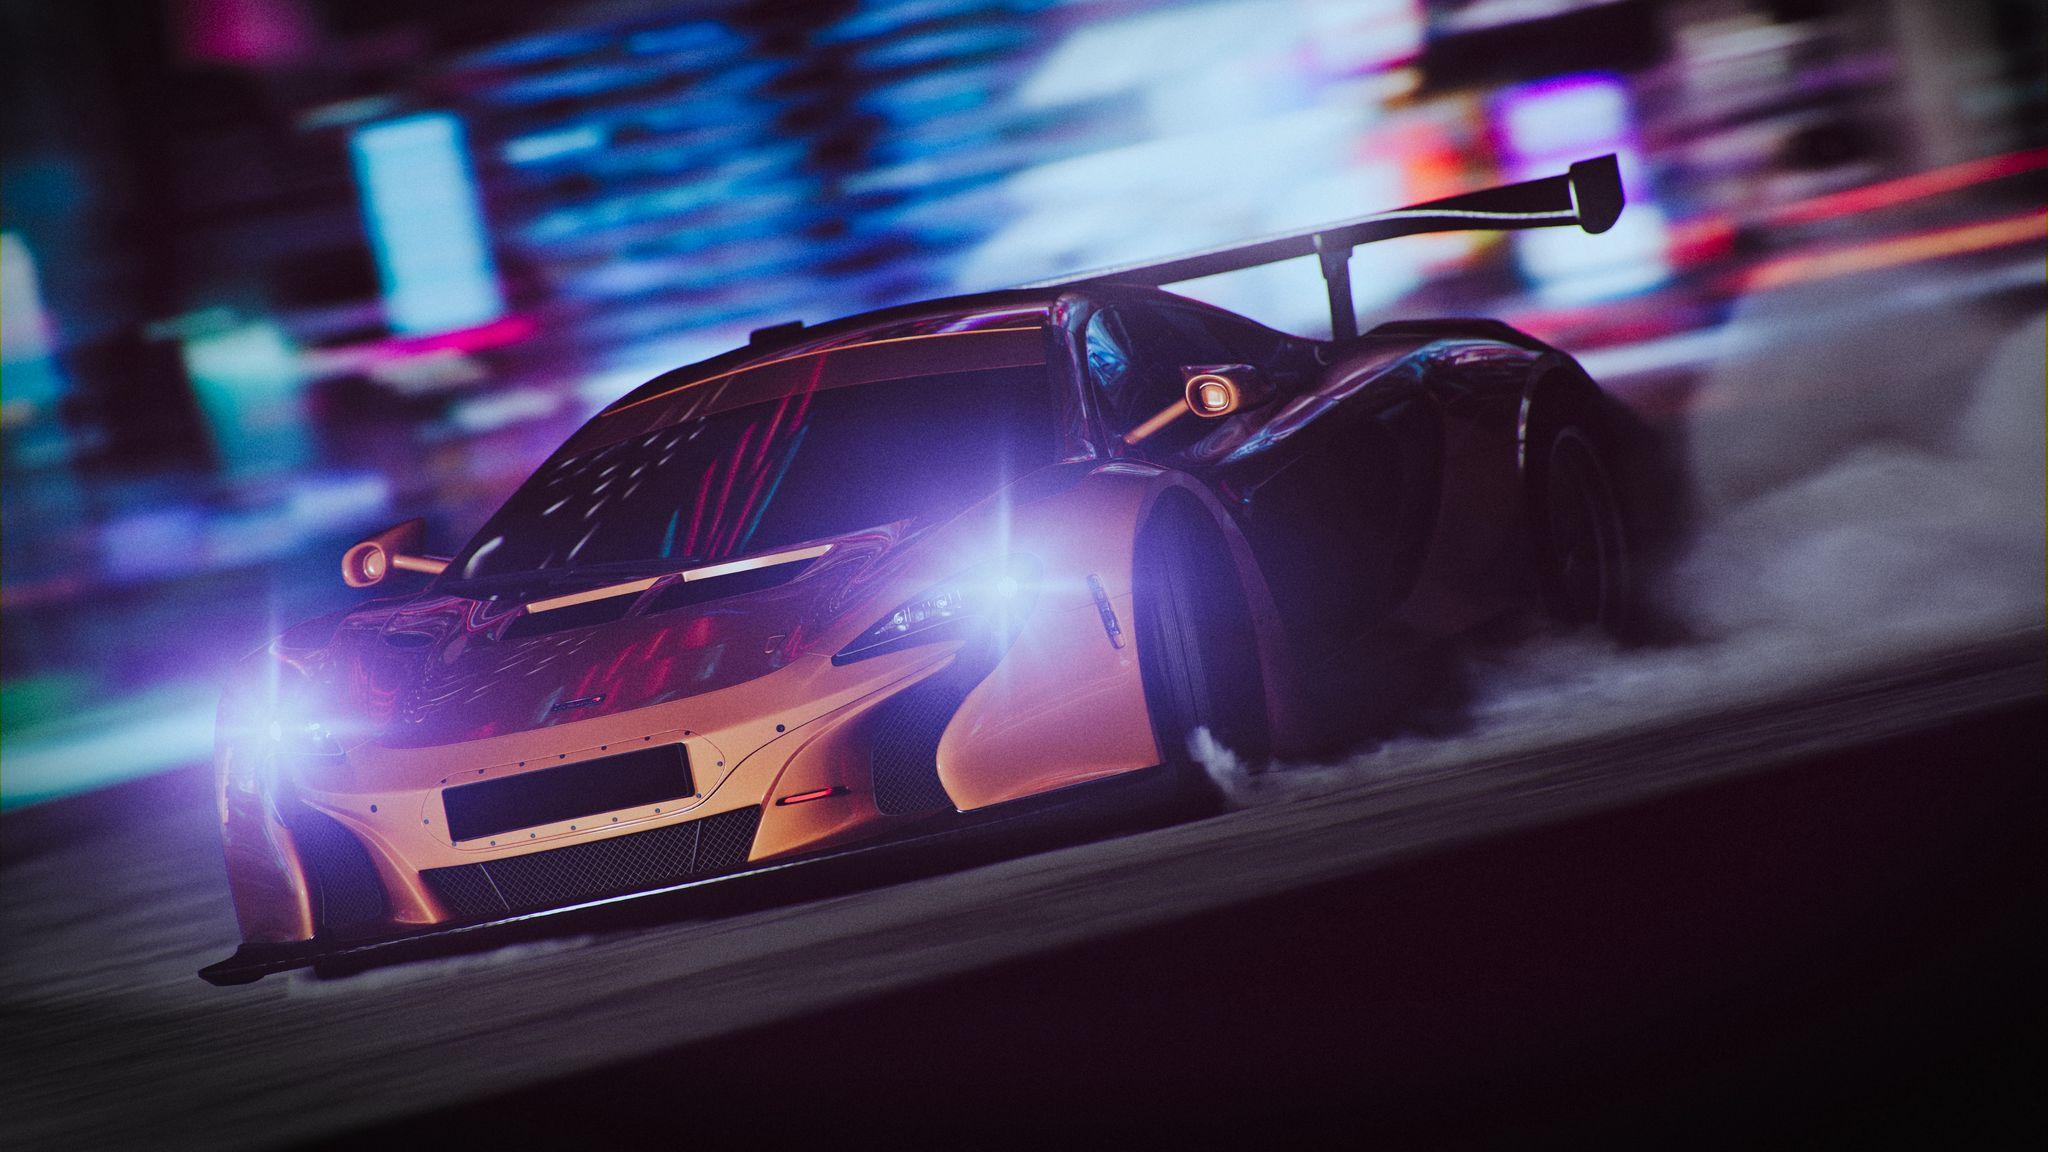 2048x1152 Wallpaper sportscar, drift, speed, night, light, smoke